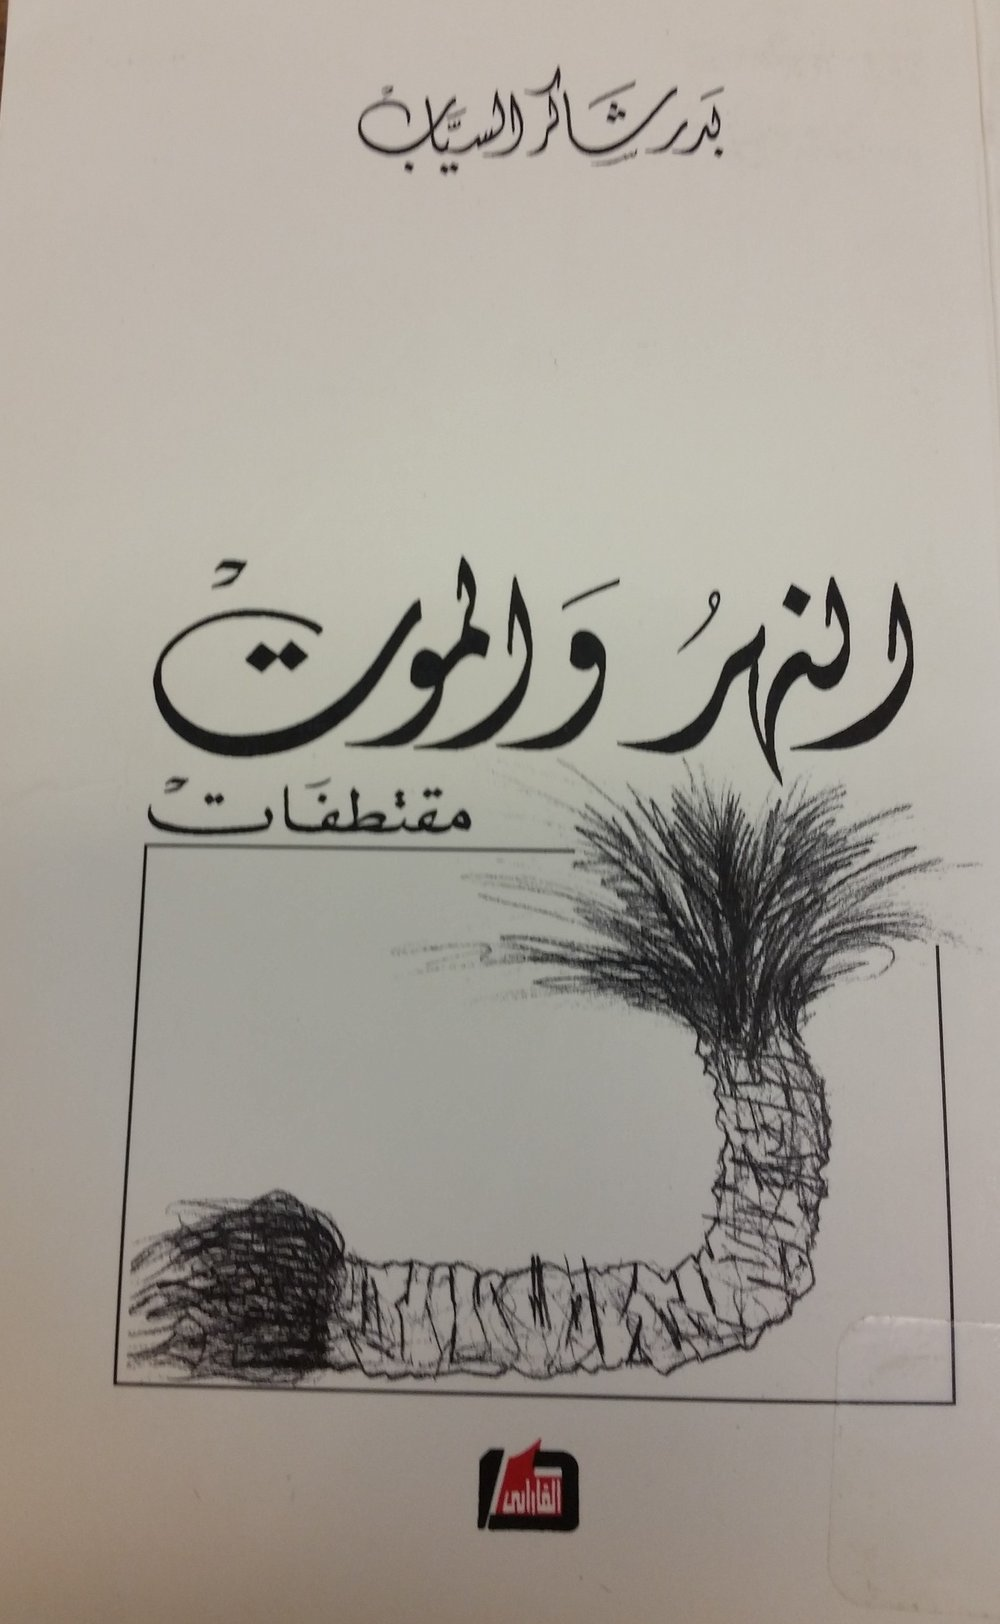 Cover of Badr Shākir al-Sayyāb's al-Nahr wa-l-mawt(Bayrūt: Dār al-Fārābī, 1998).